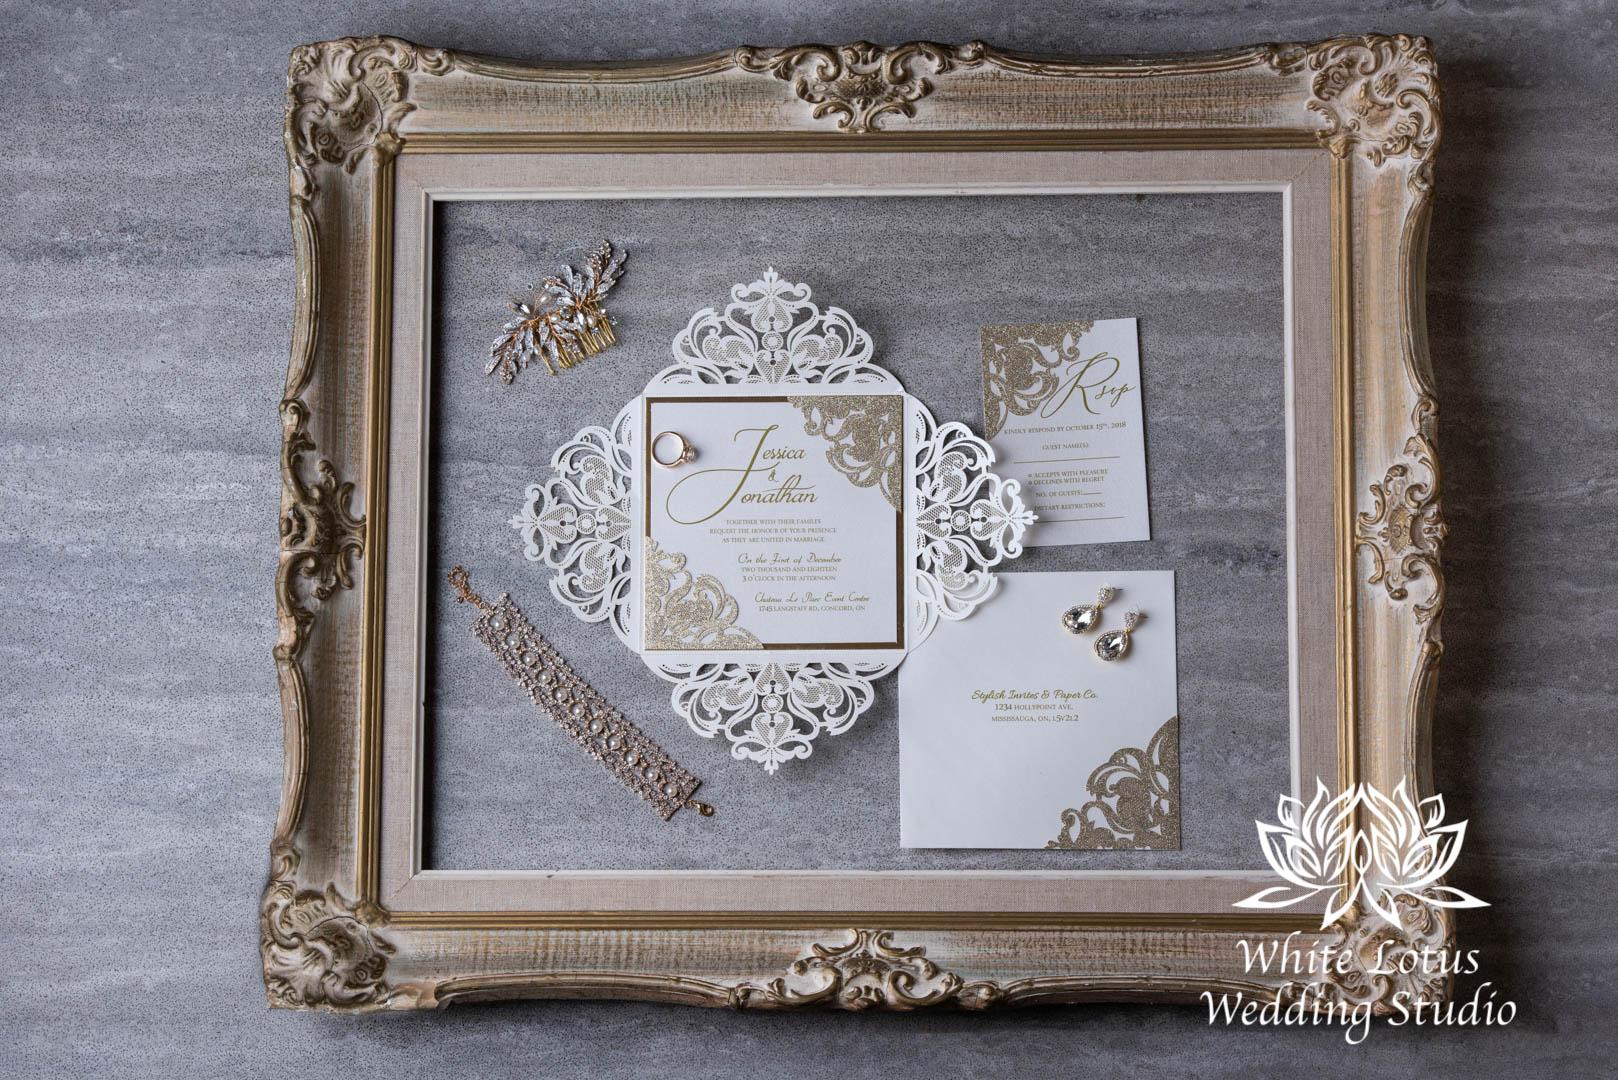 001- GLAM WINTERLUXE WEDDING INSPIRATION